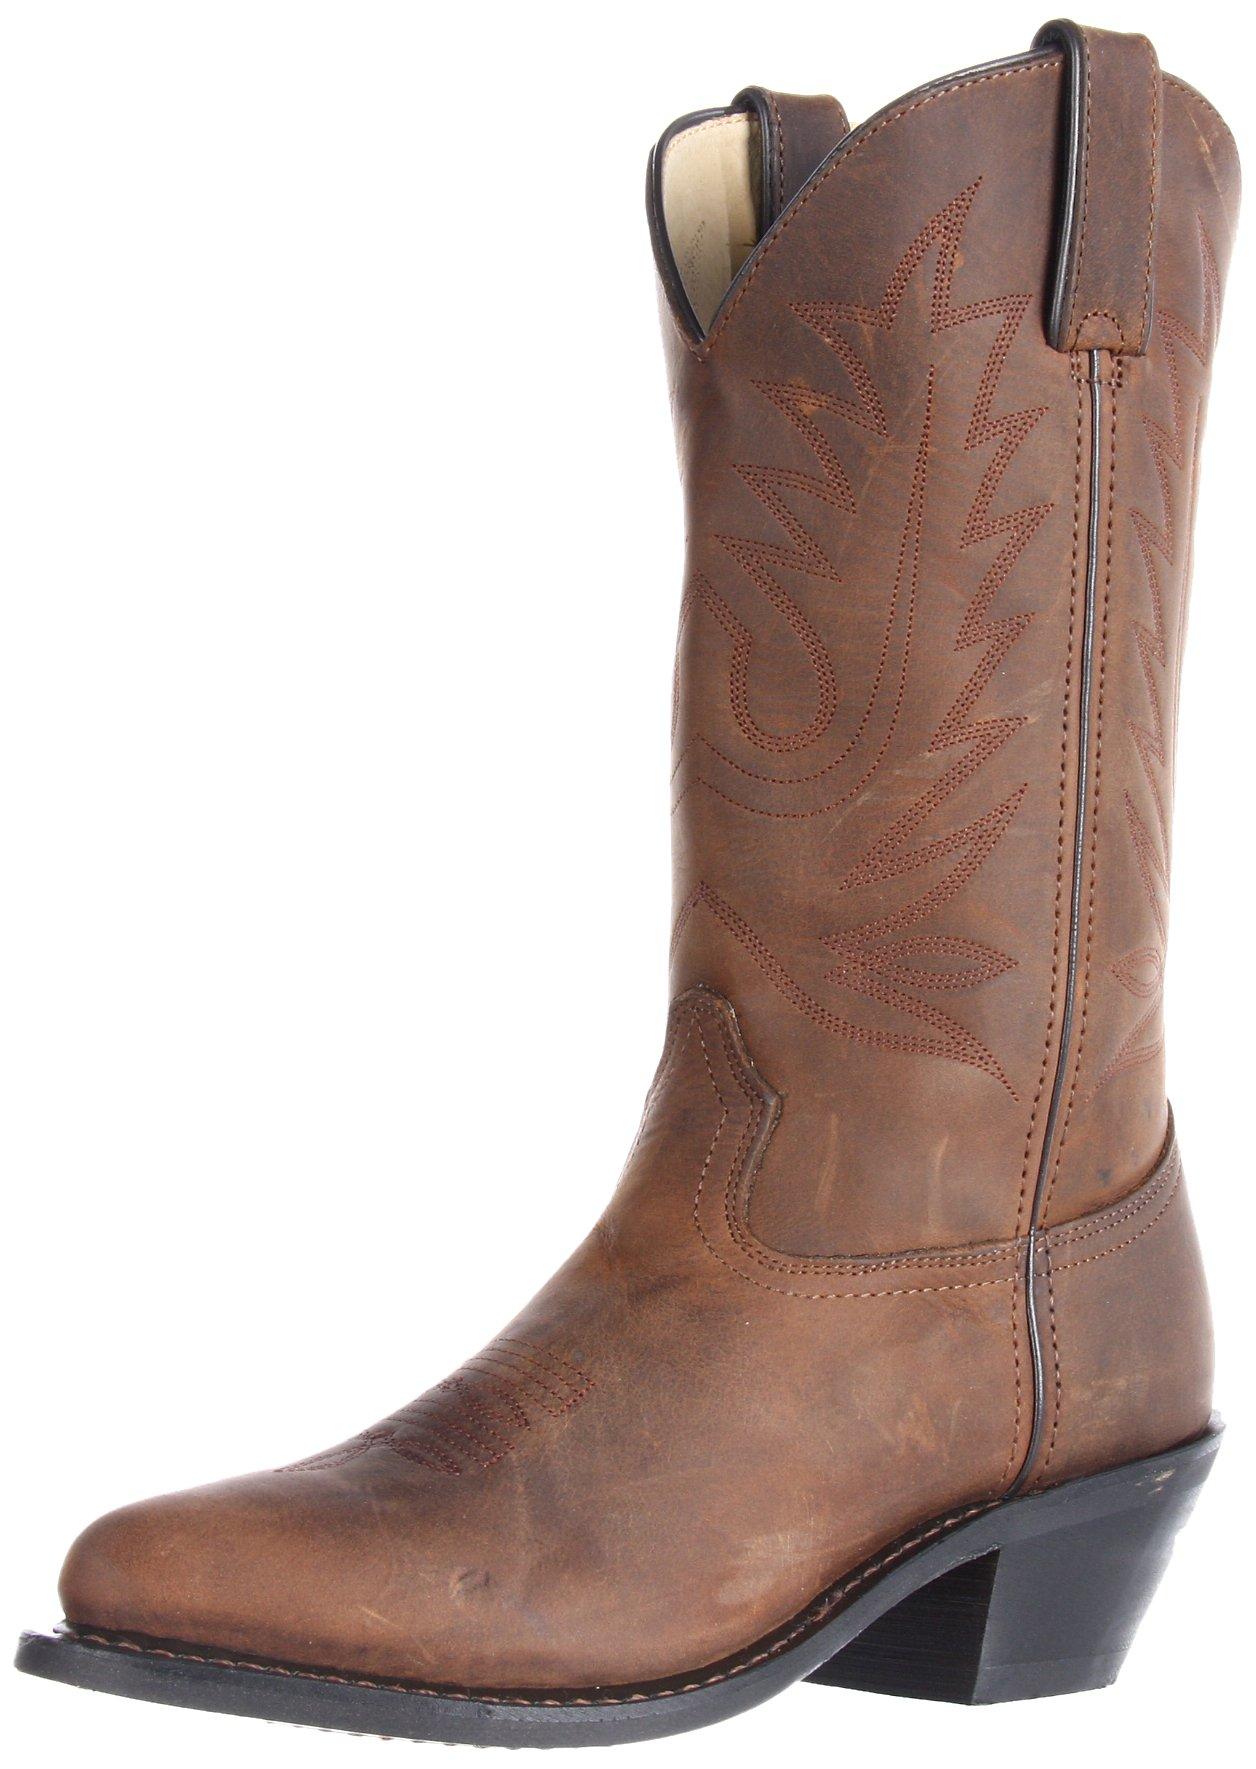 Durango Women's RD4112 Classic 11'' Western Boot,Wild Tan,6 M US